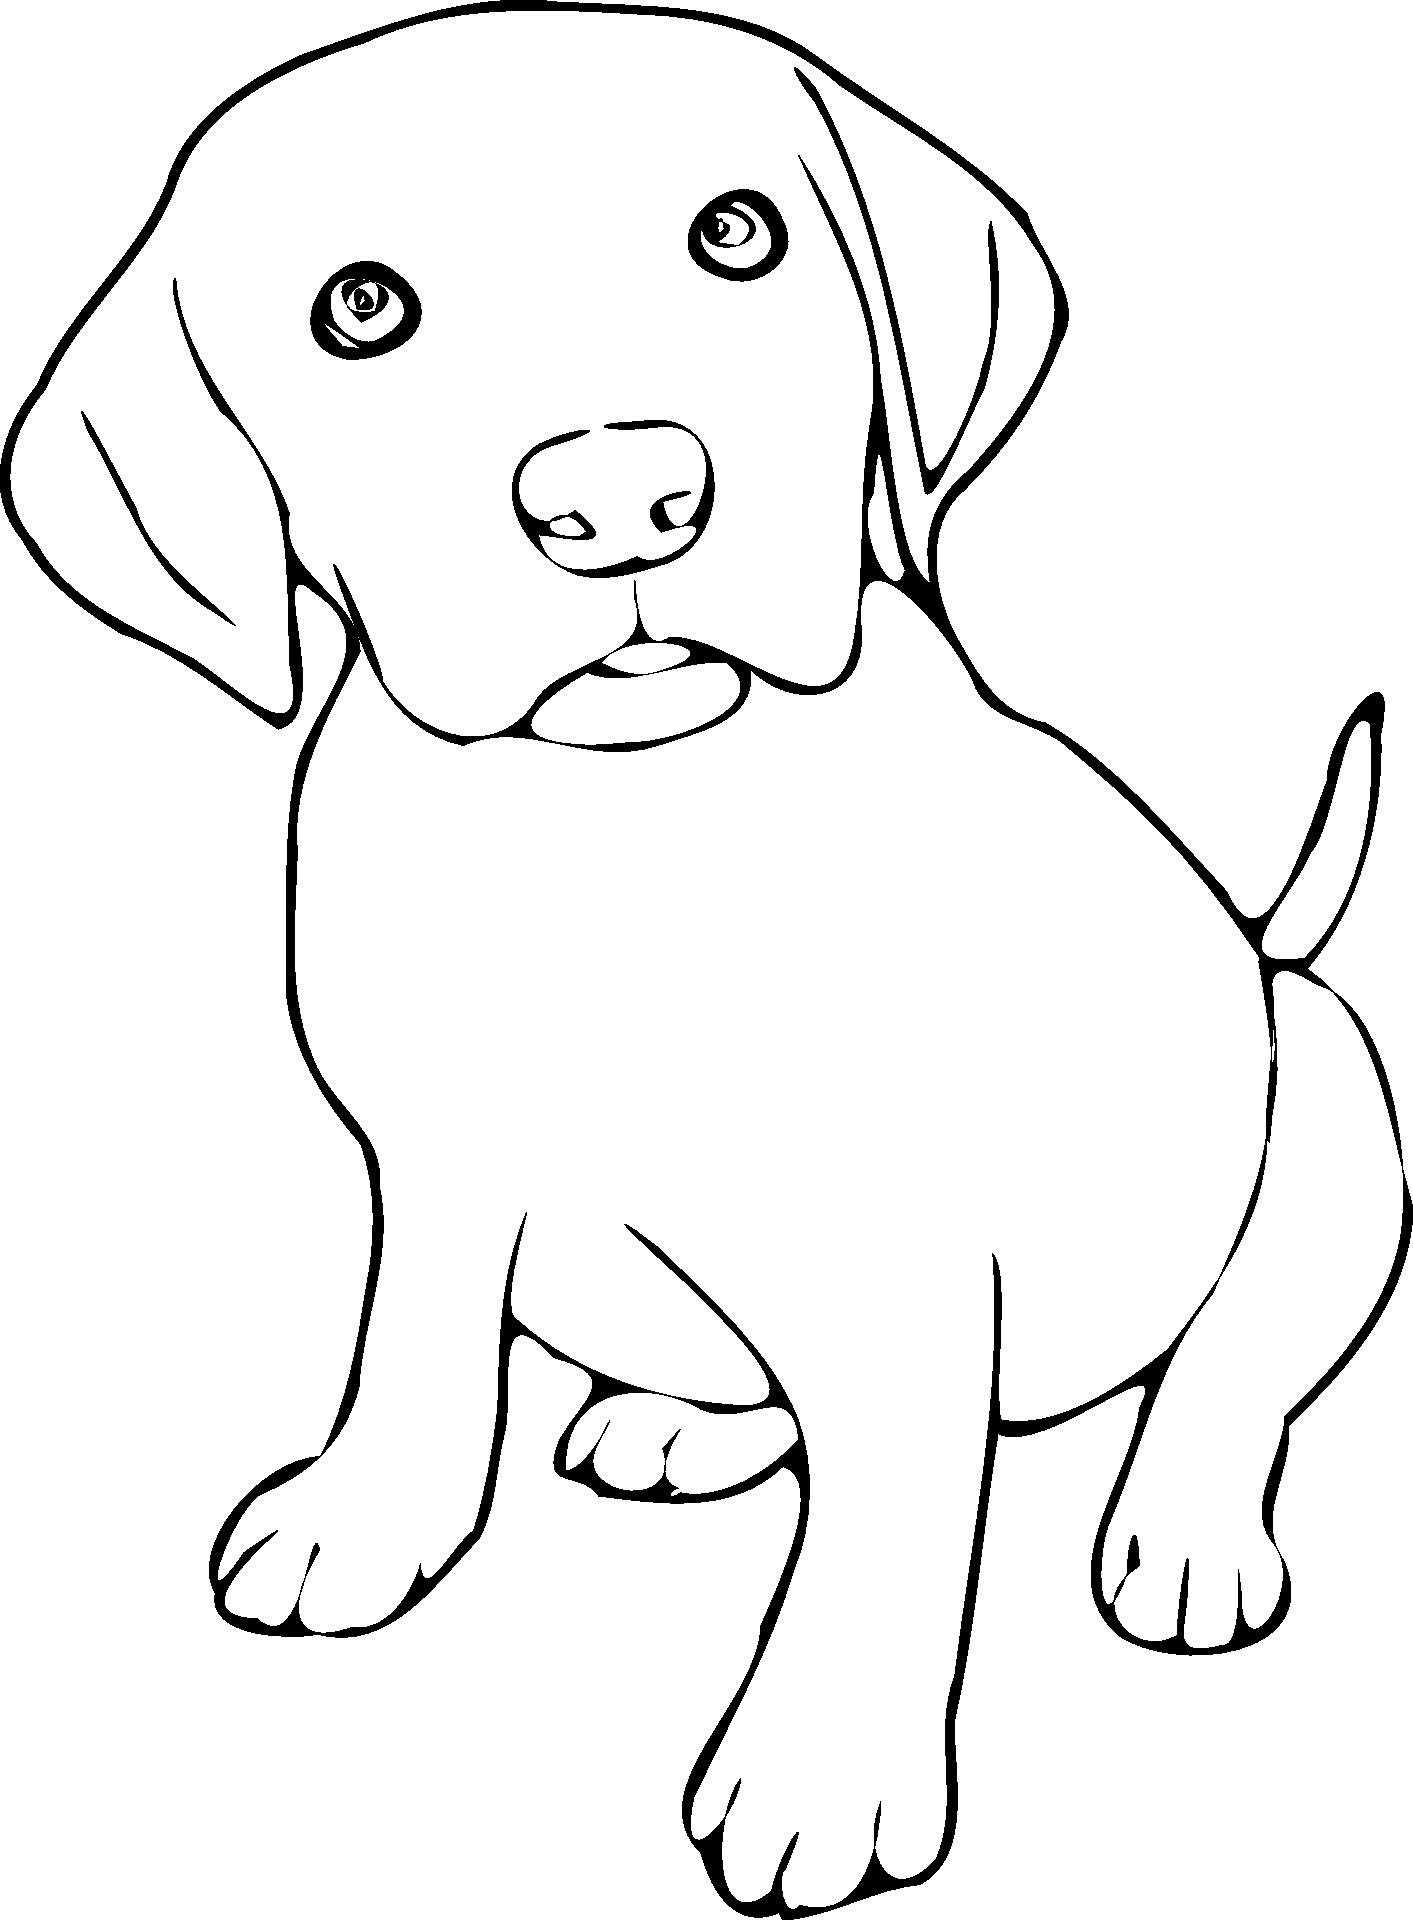 Labrador Kolorowanka Do Druku